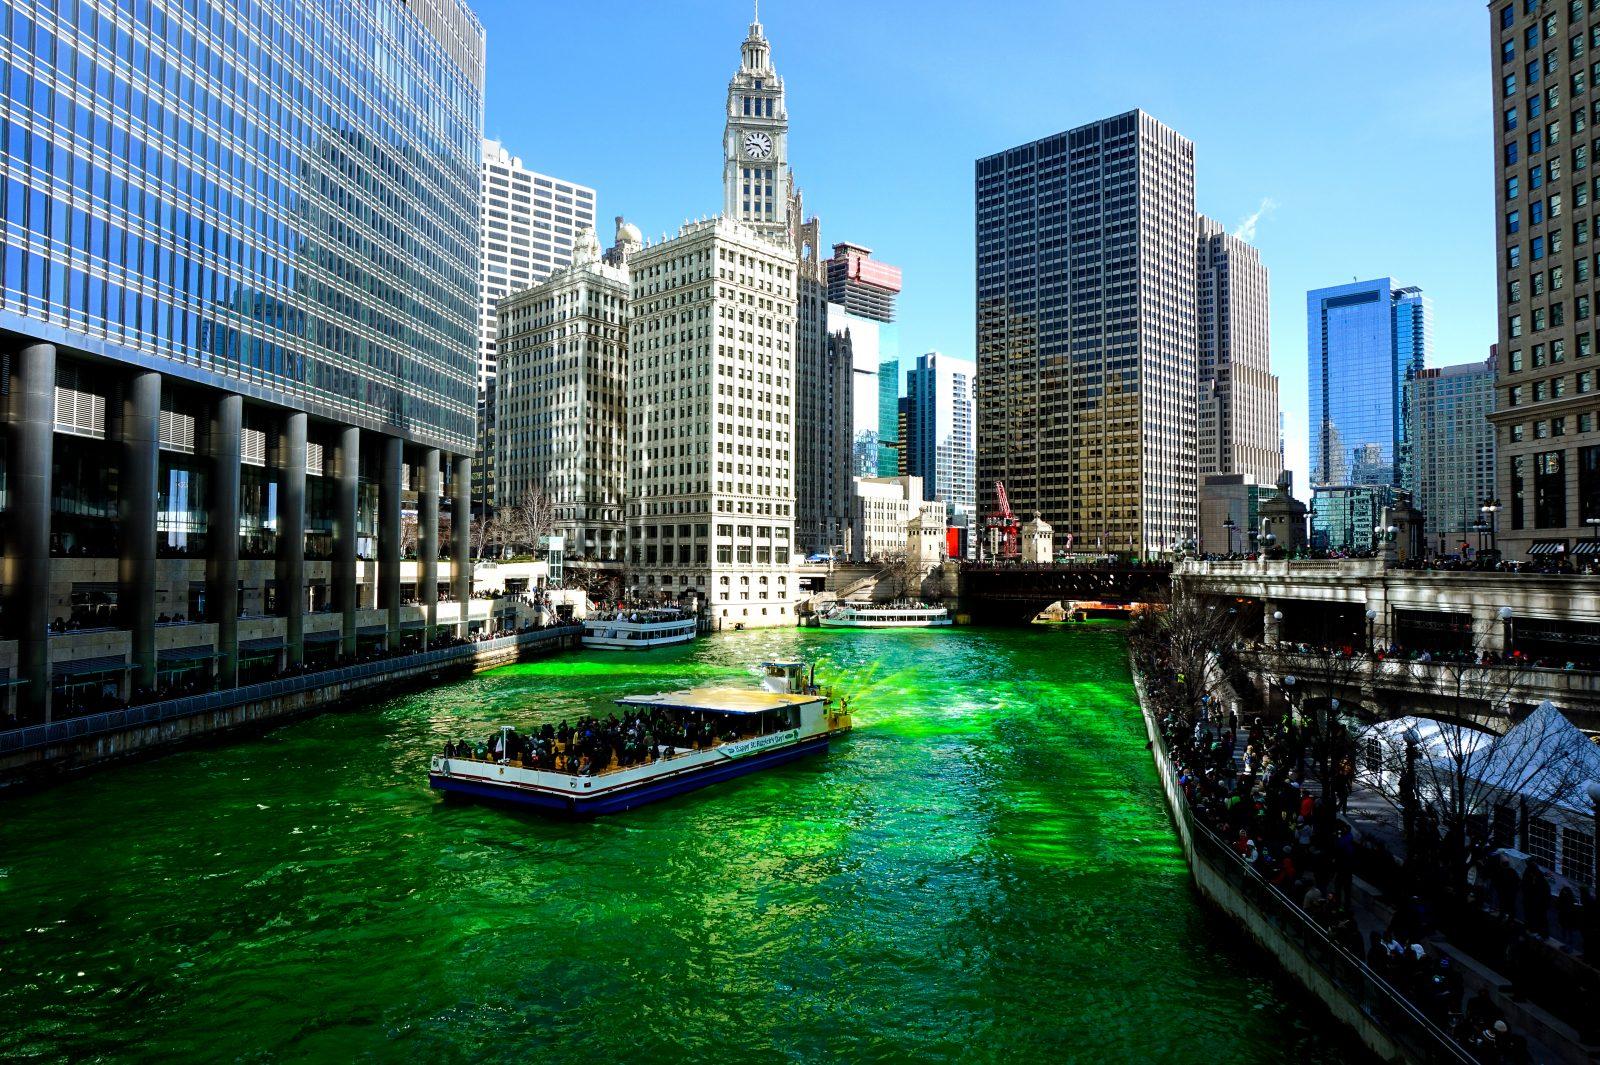 St Patricks Day - Chicago